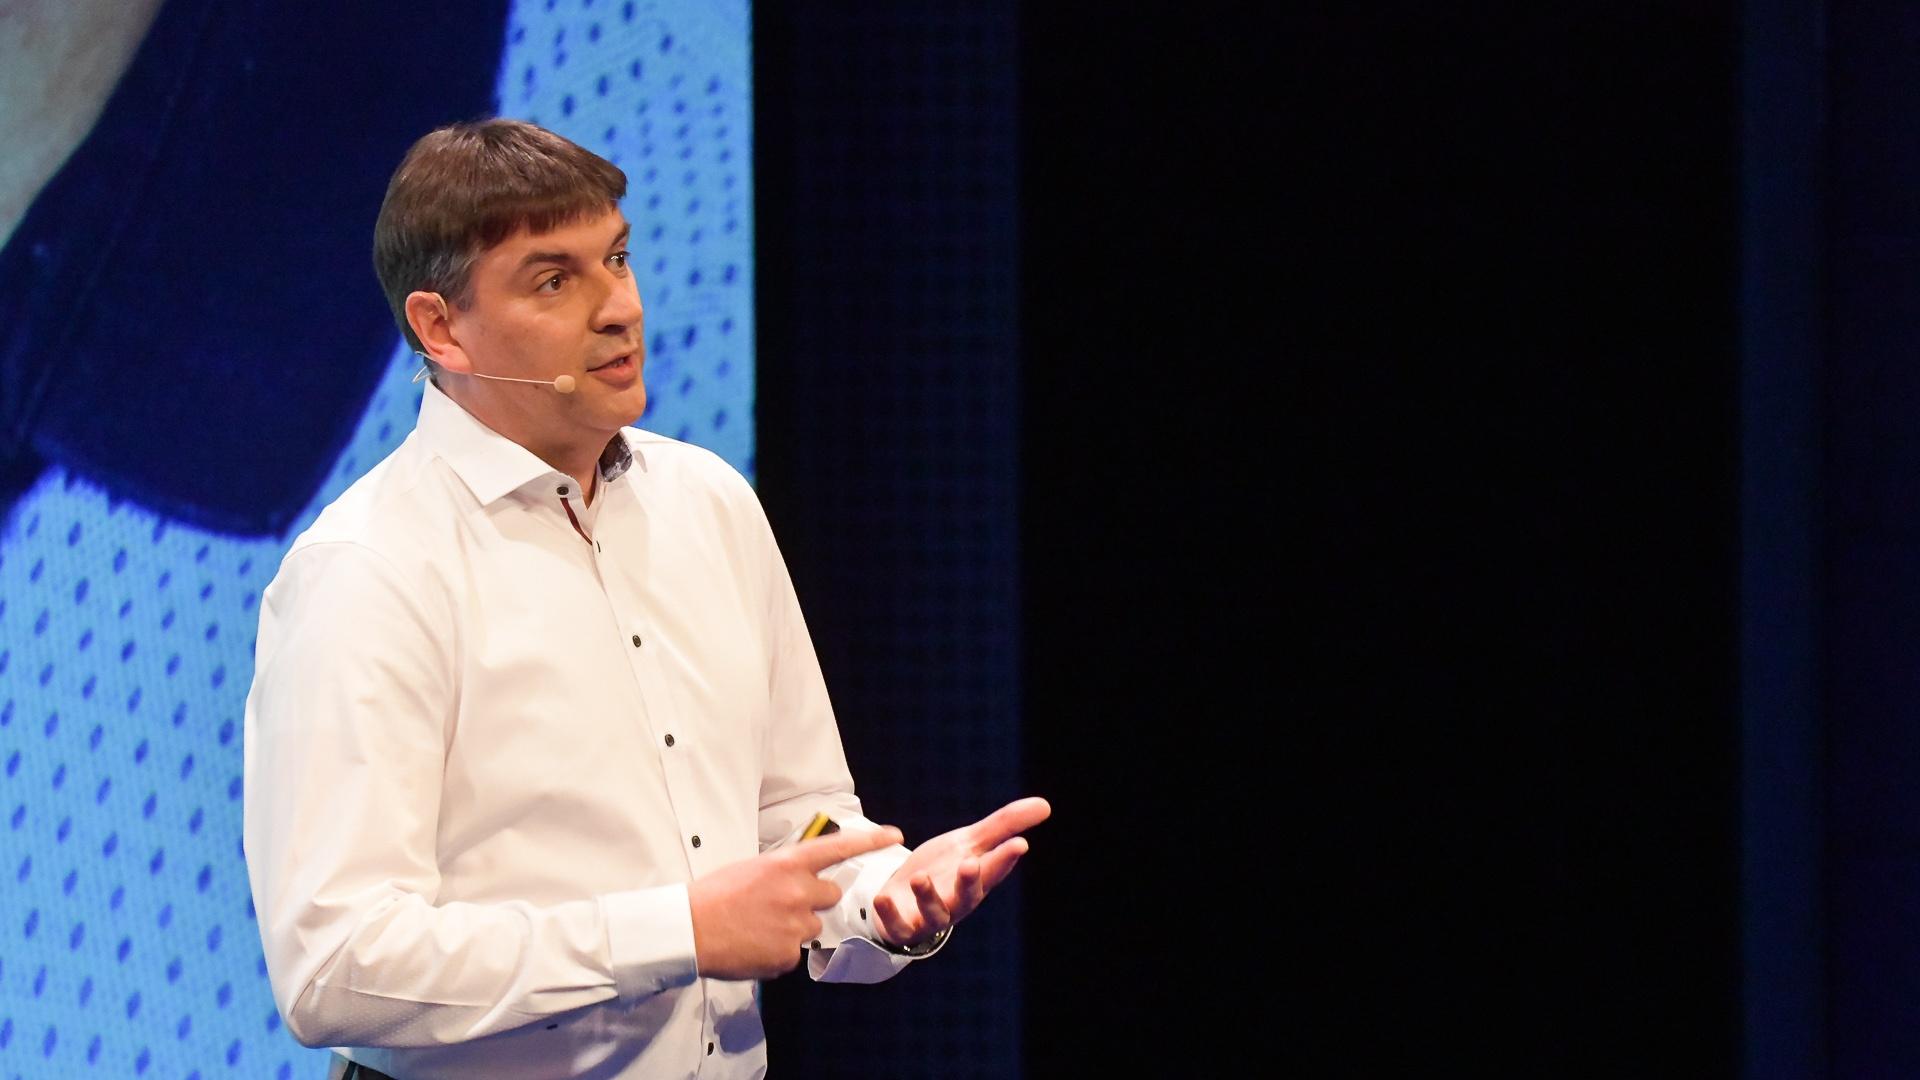 Pavel Motan - Paralely života a výroby